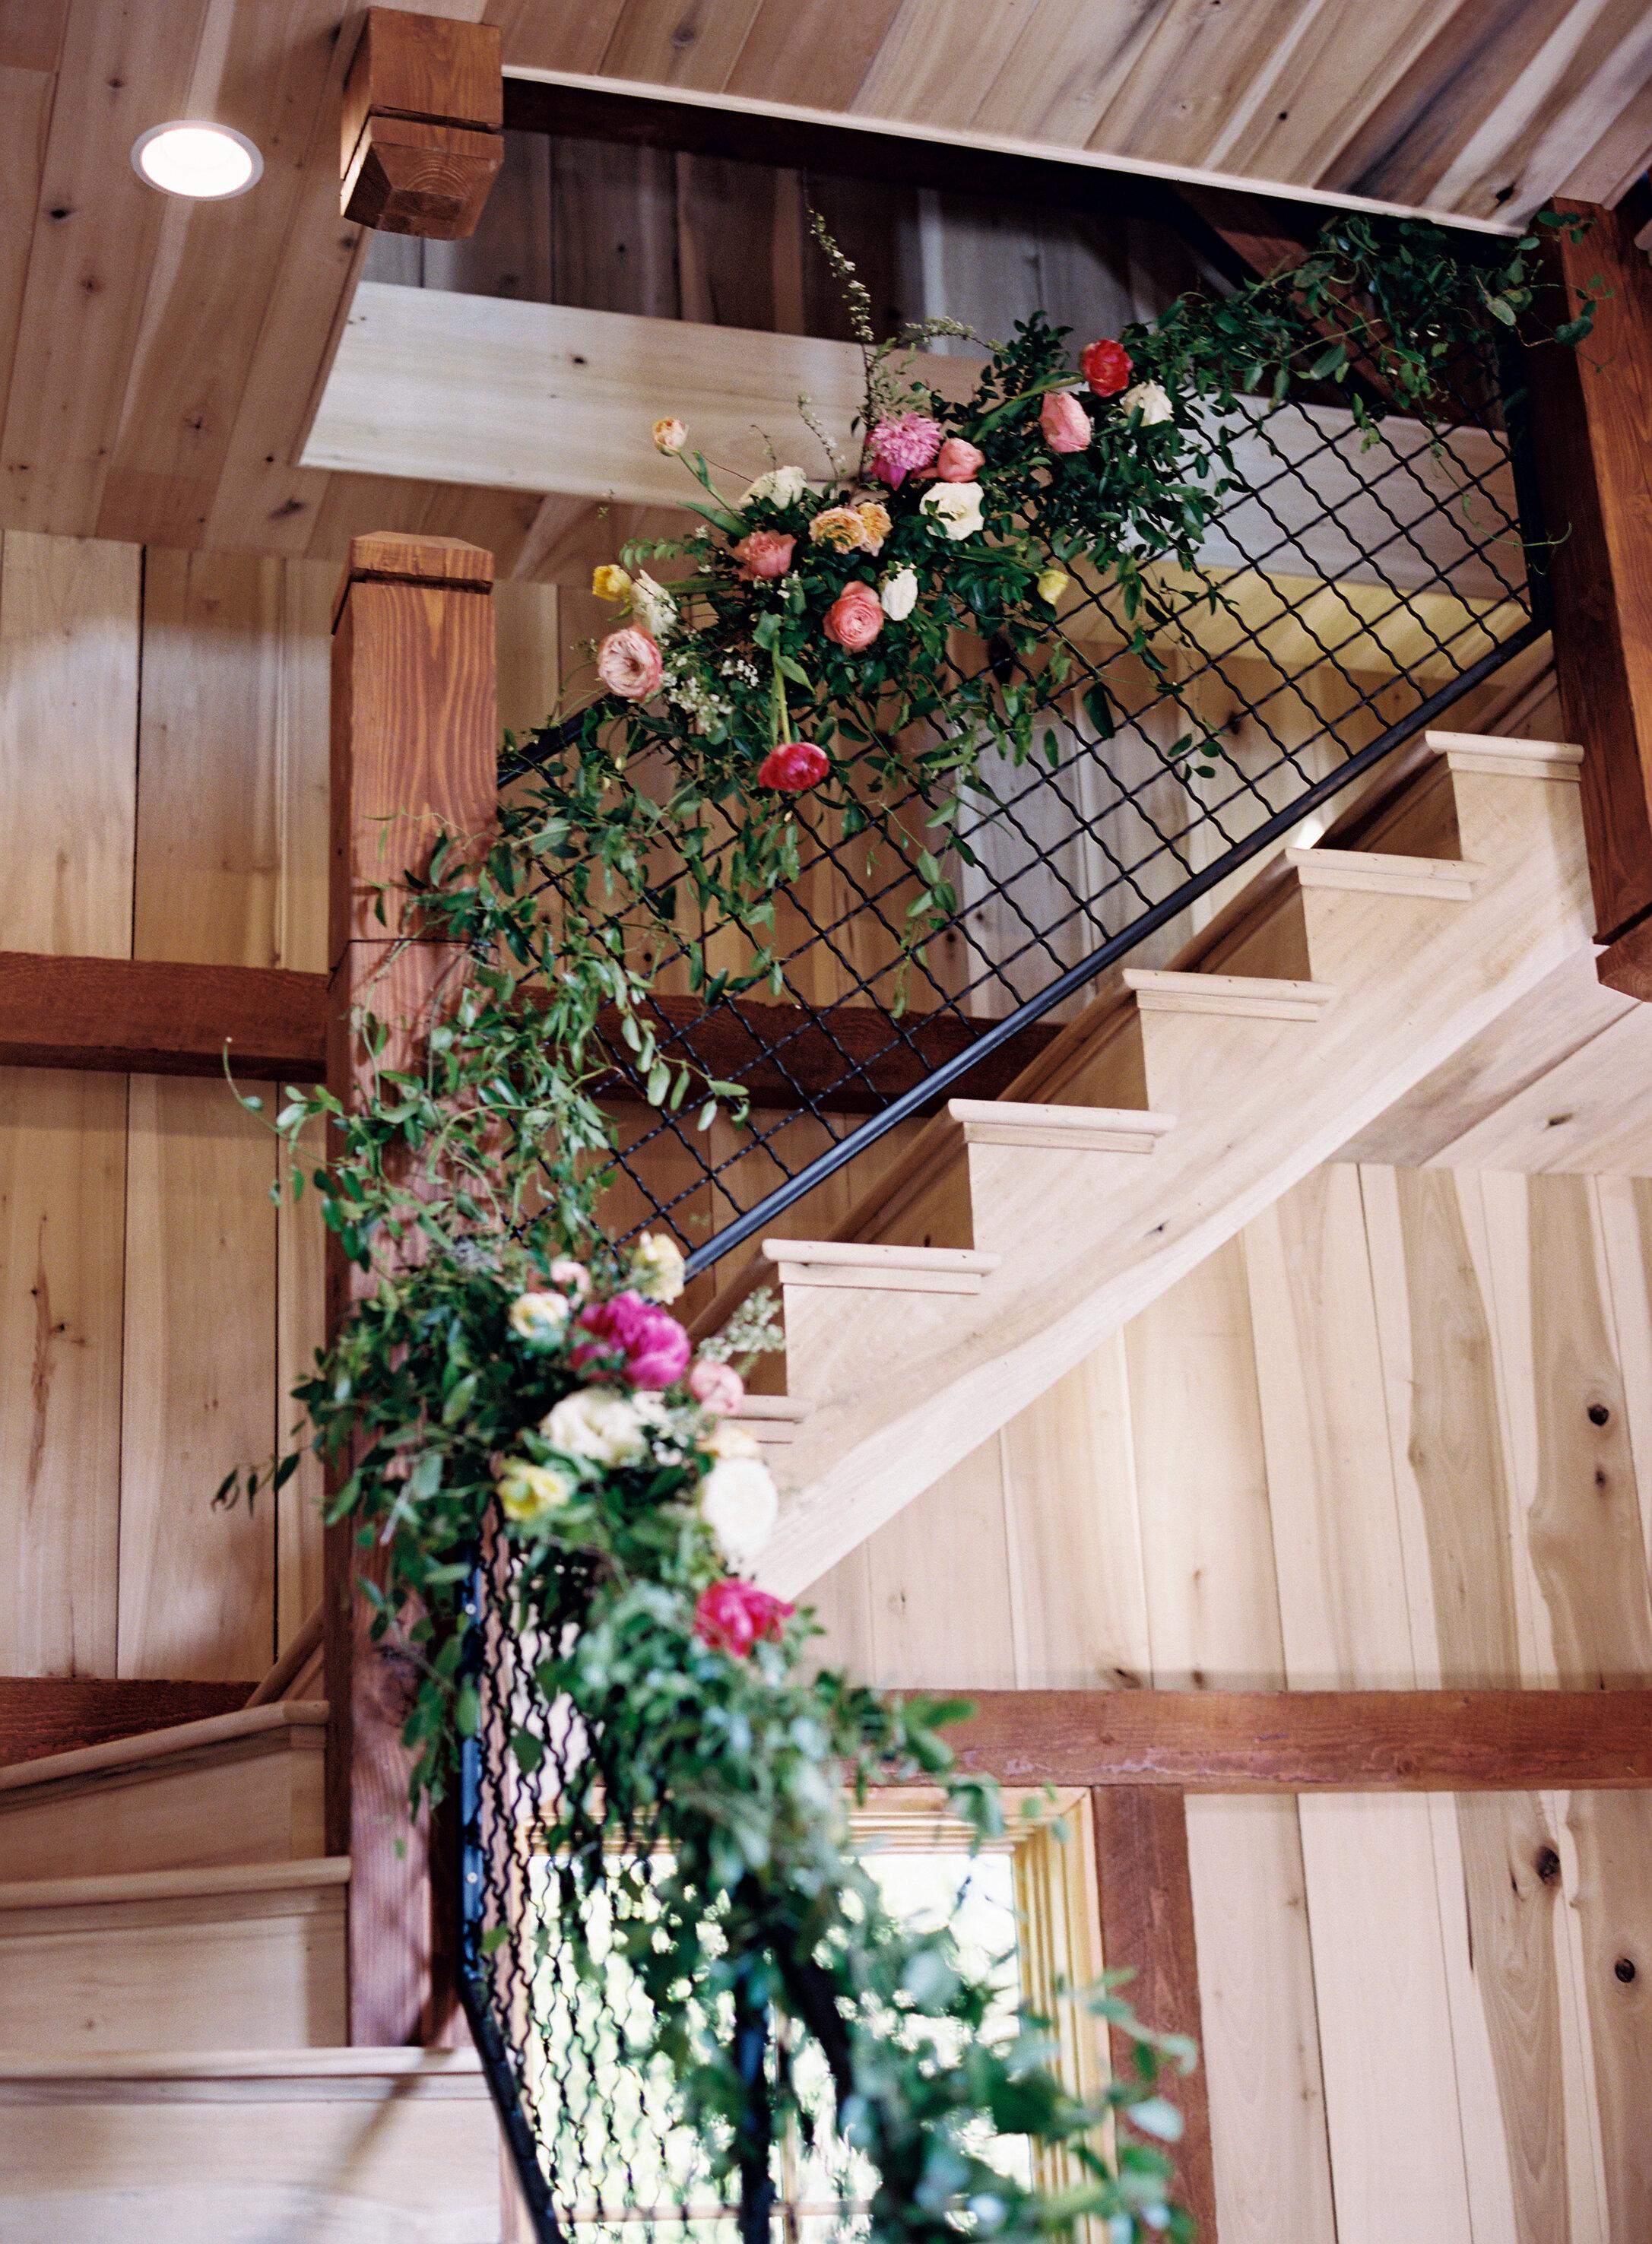 Floral installation on bannister